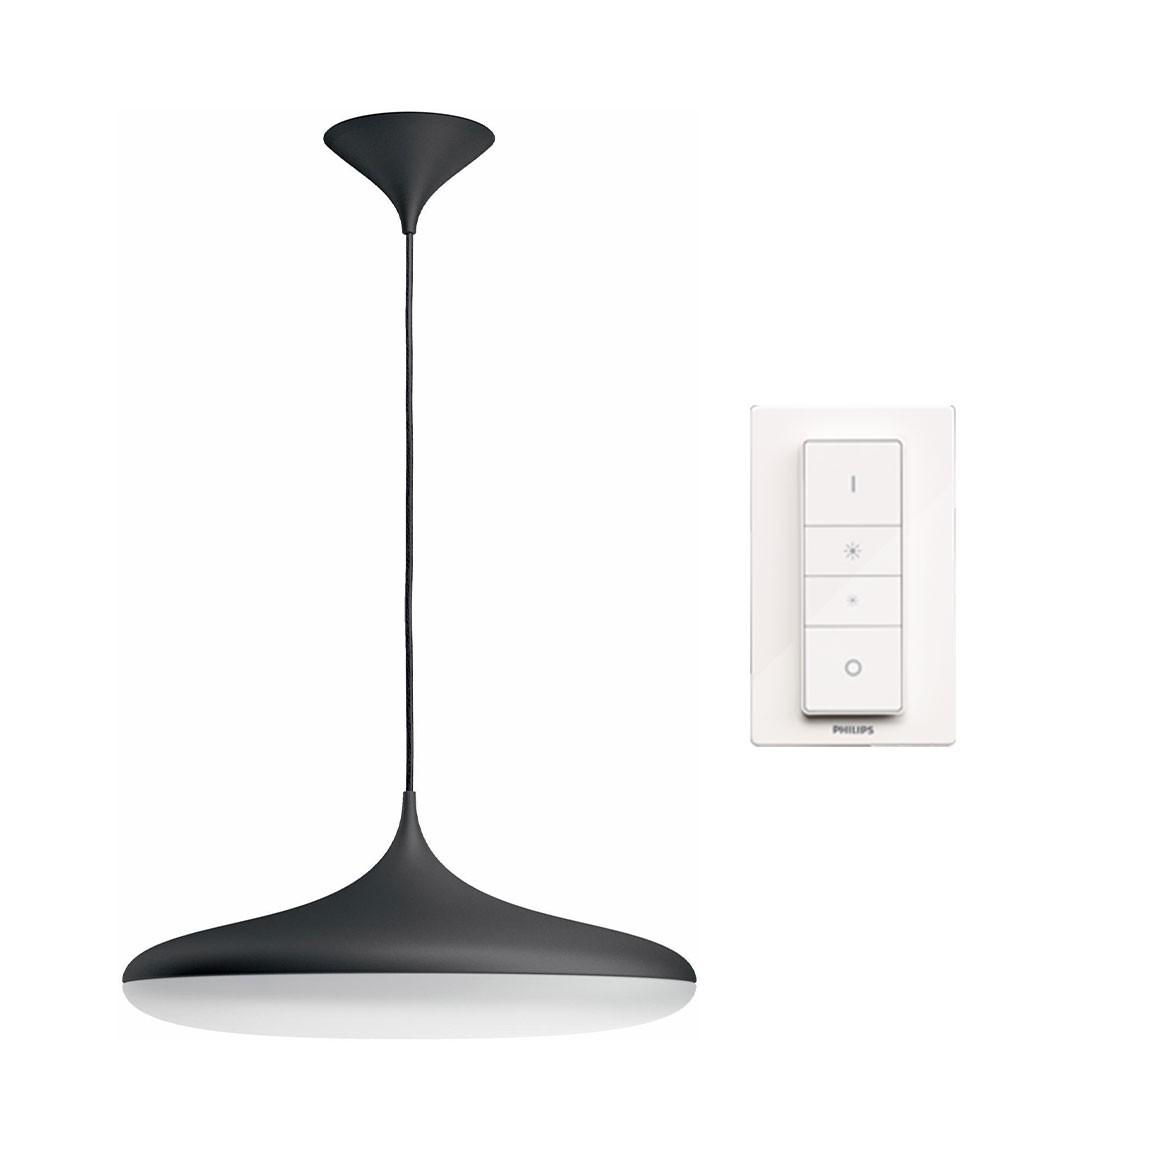 Philips Hue Cher Bluetooth LED Pendelleuchte 3000lm inkl. Dimmschalter - Schwarz